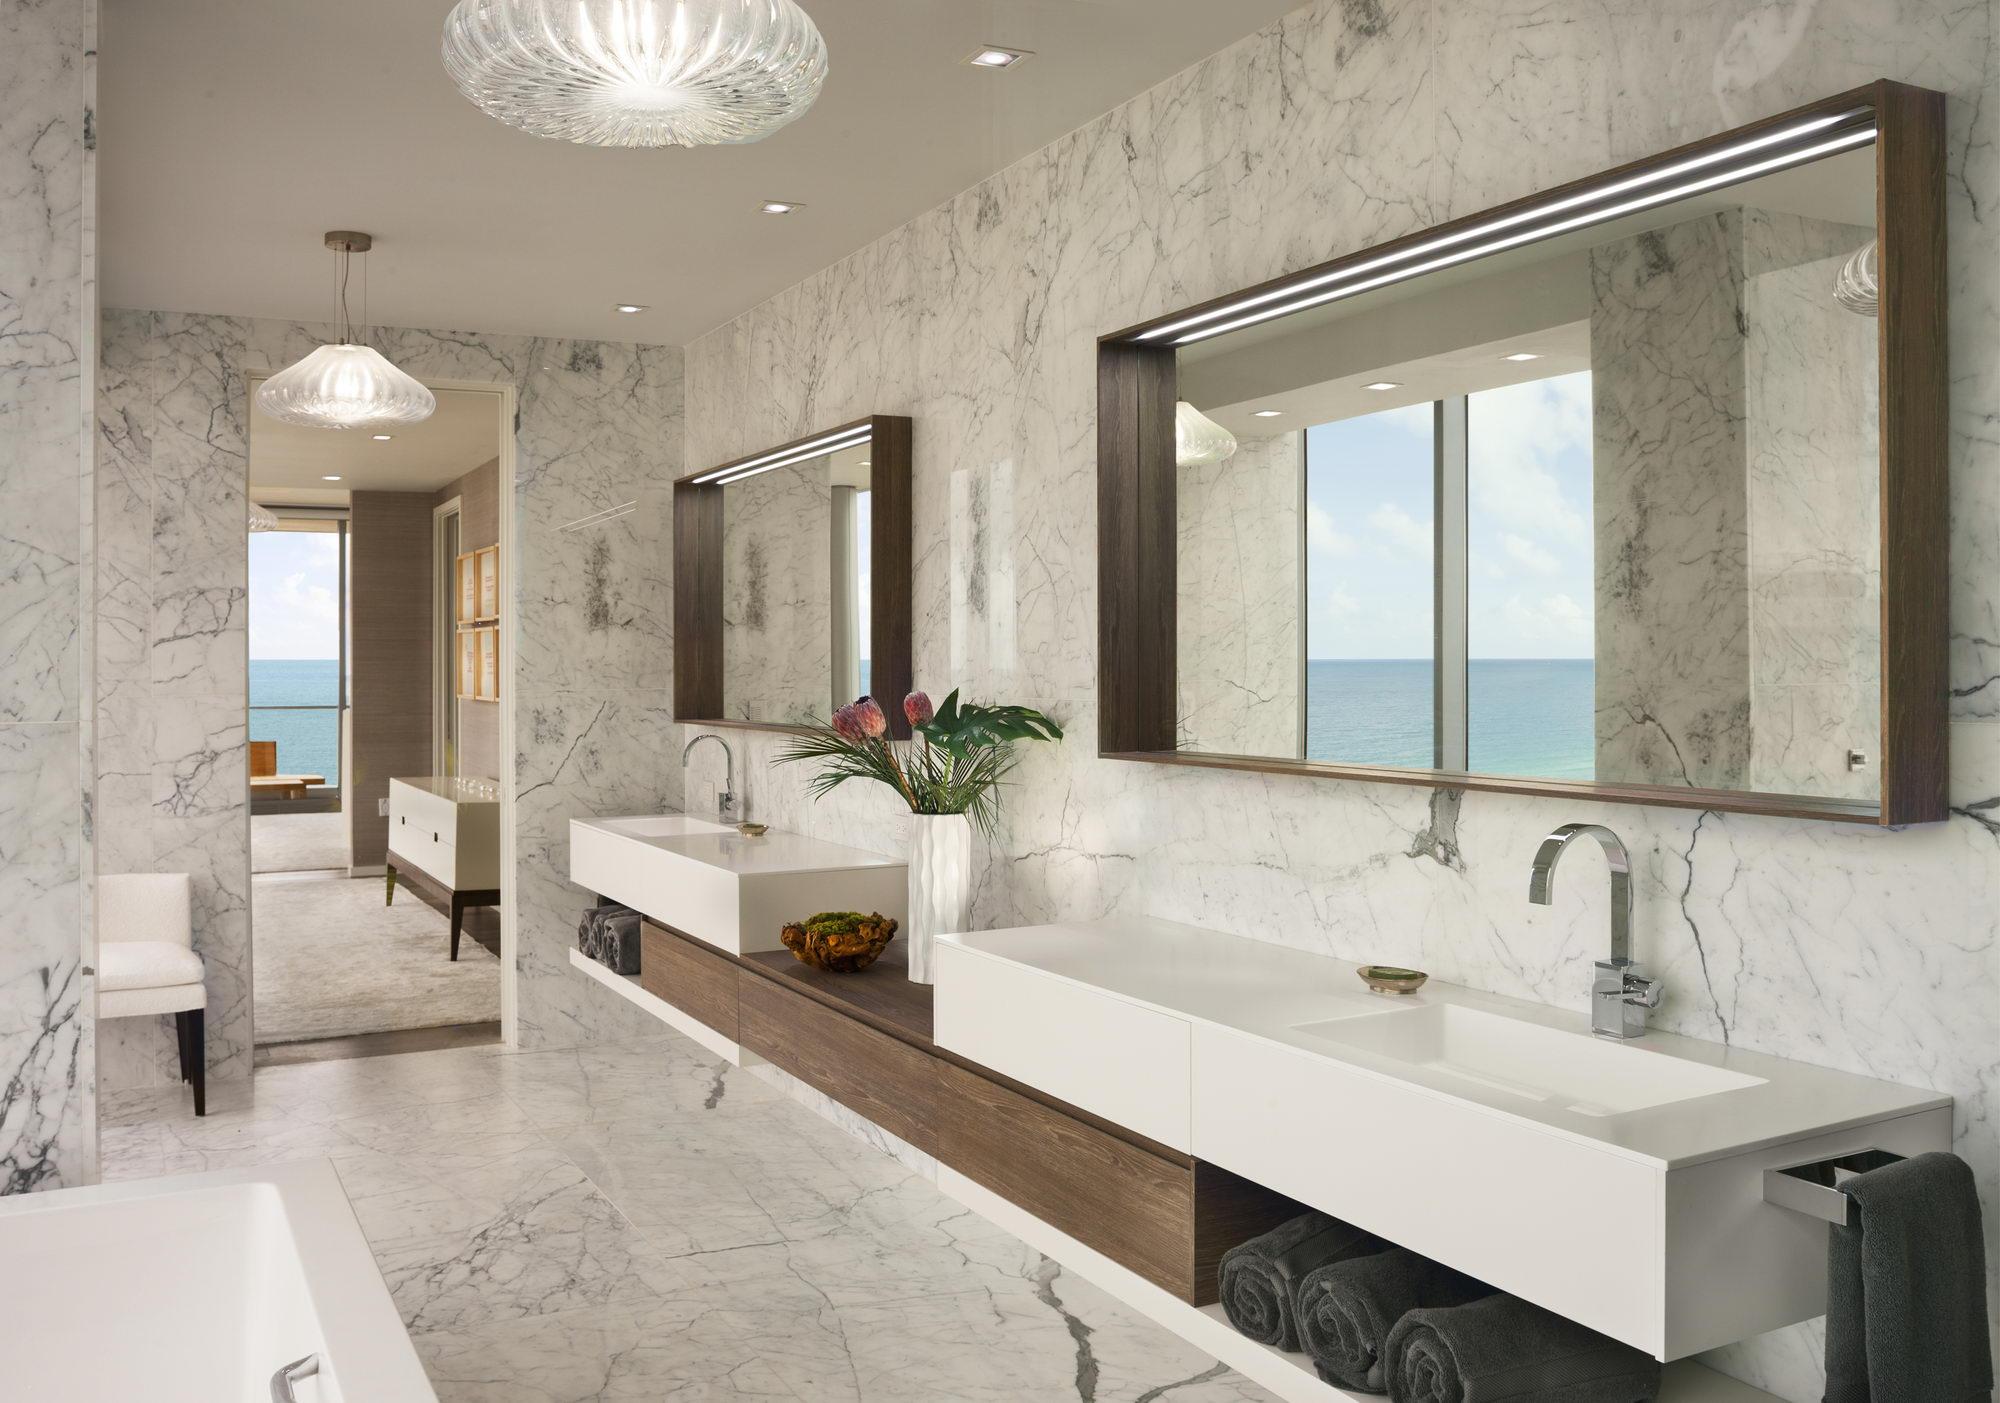 Ocean penthouse beach view south beach Miami Florida contemporary apartment master bathroom marble ocean view